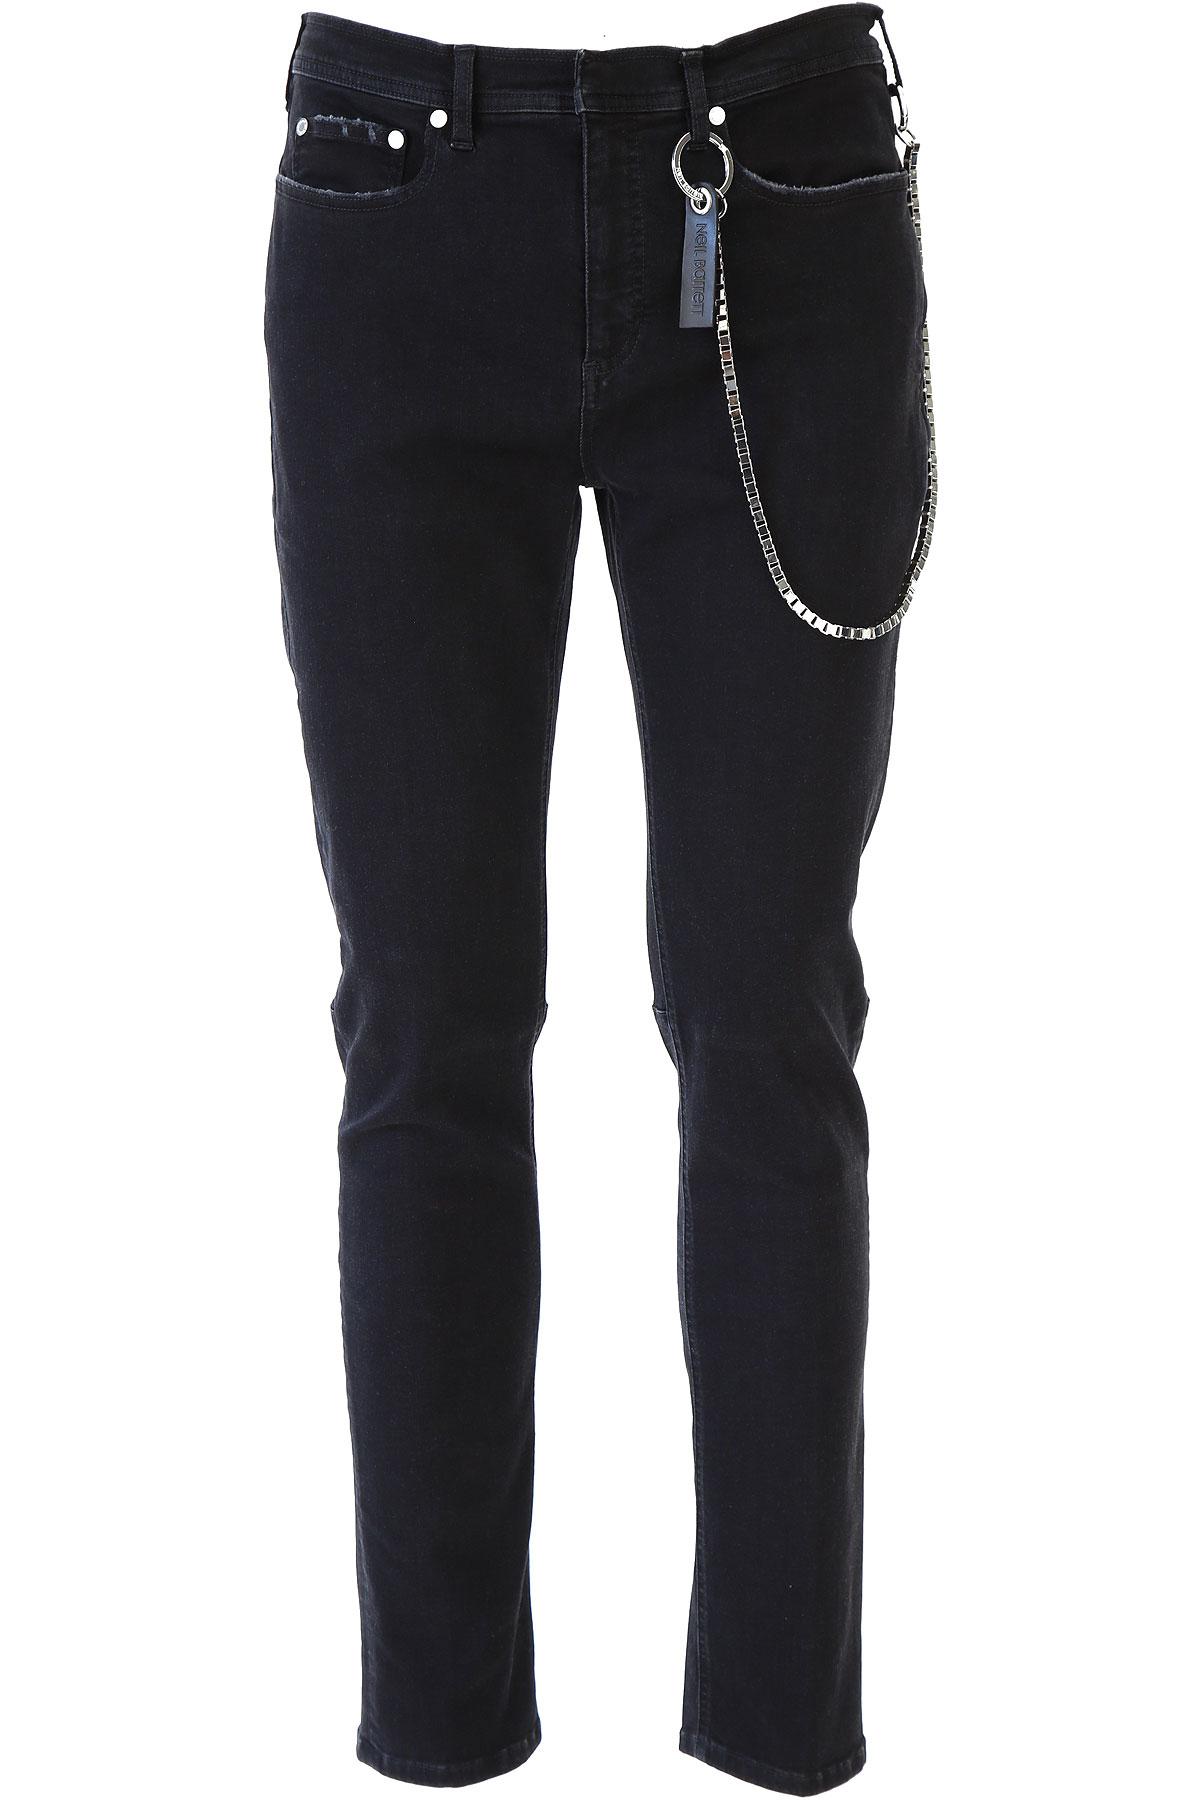 Neil Barrett Jeans On Sale, Black, Cotton, 2019, 29 31 33